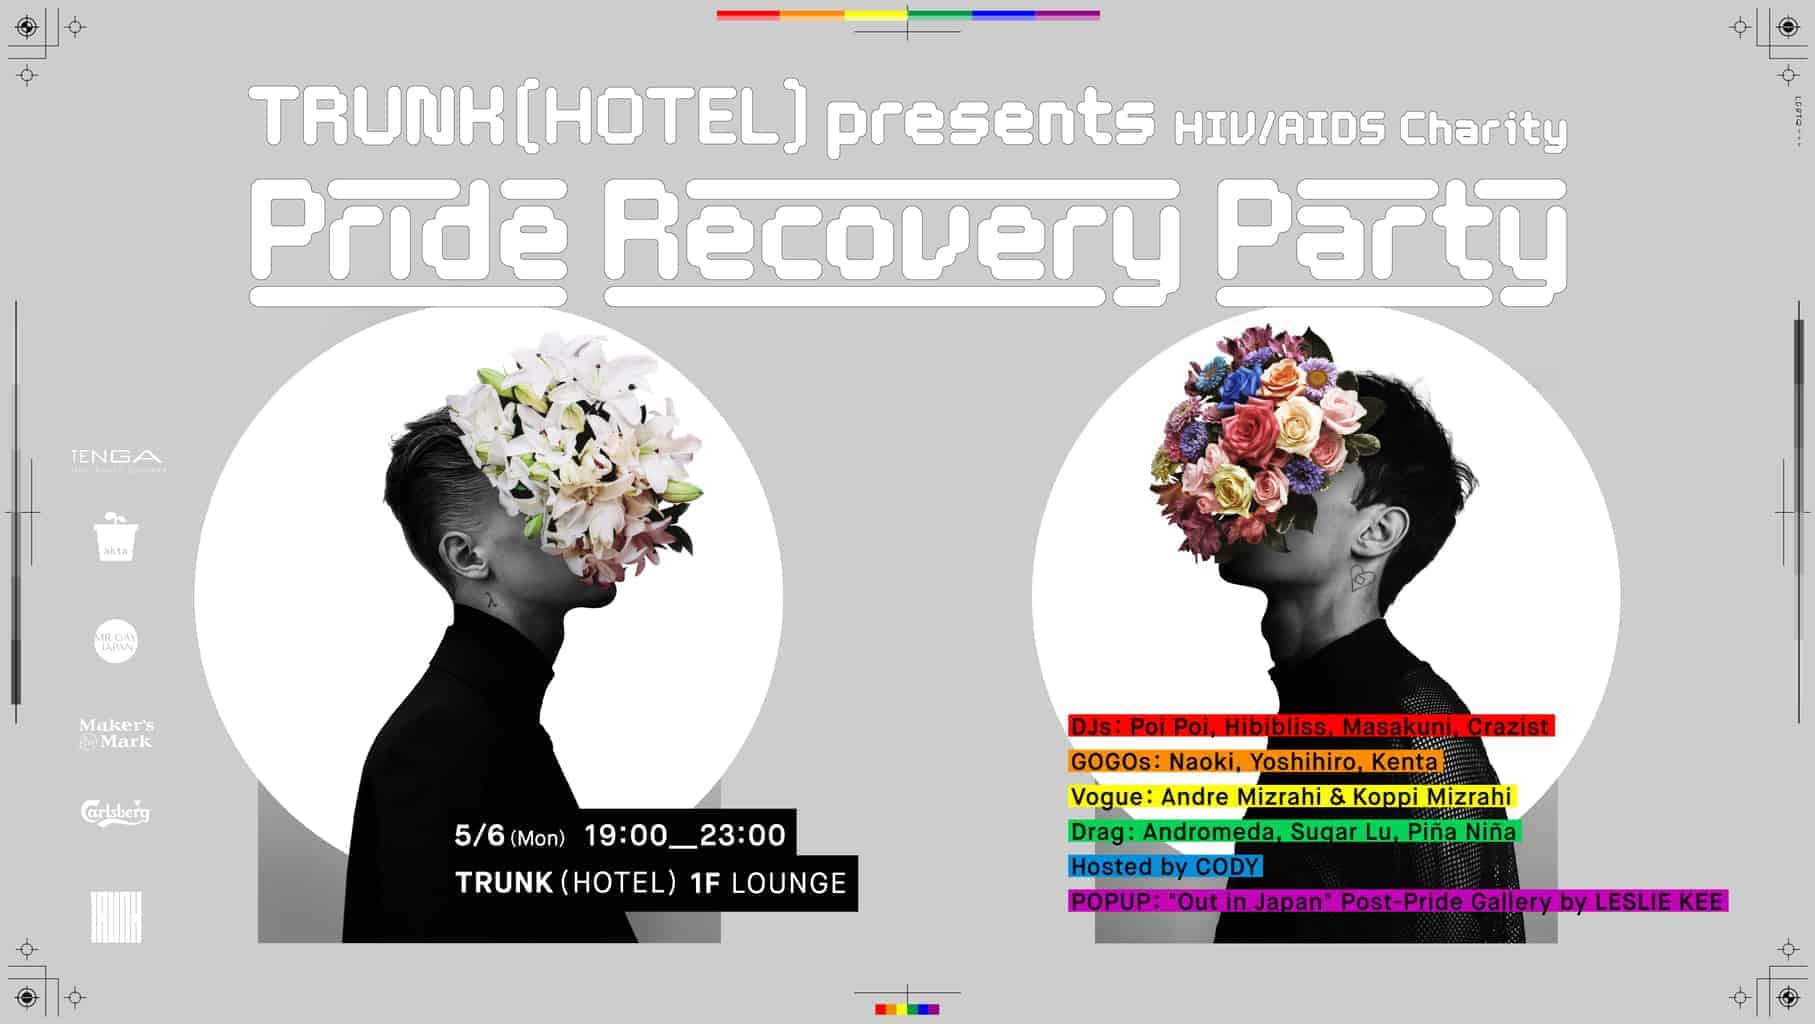 TRUNK(HOTEL)举办骄傲恢复派对